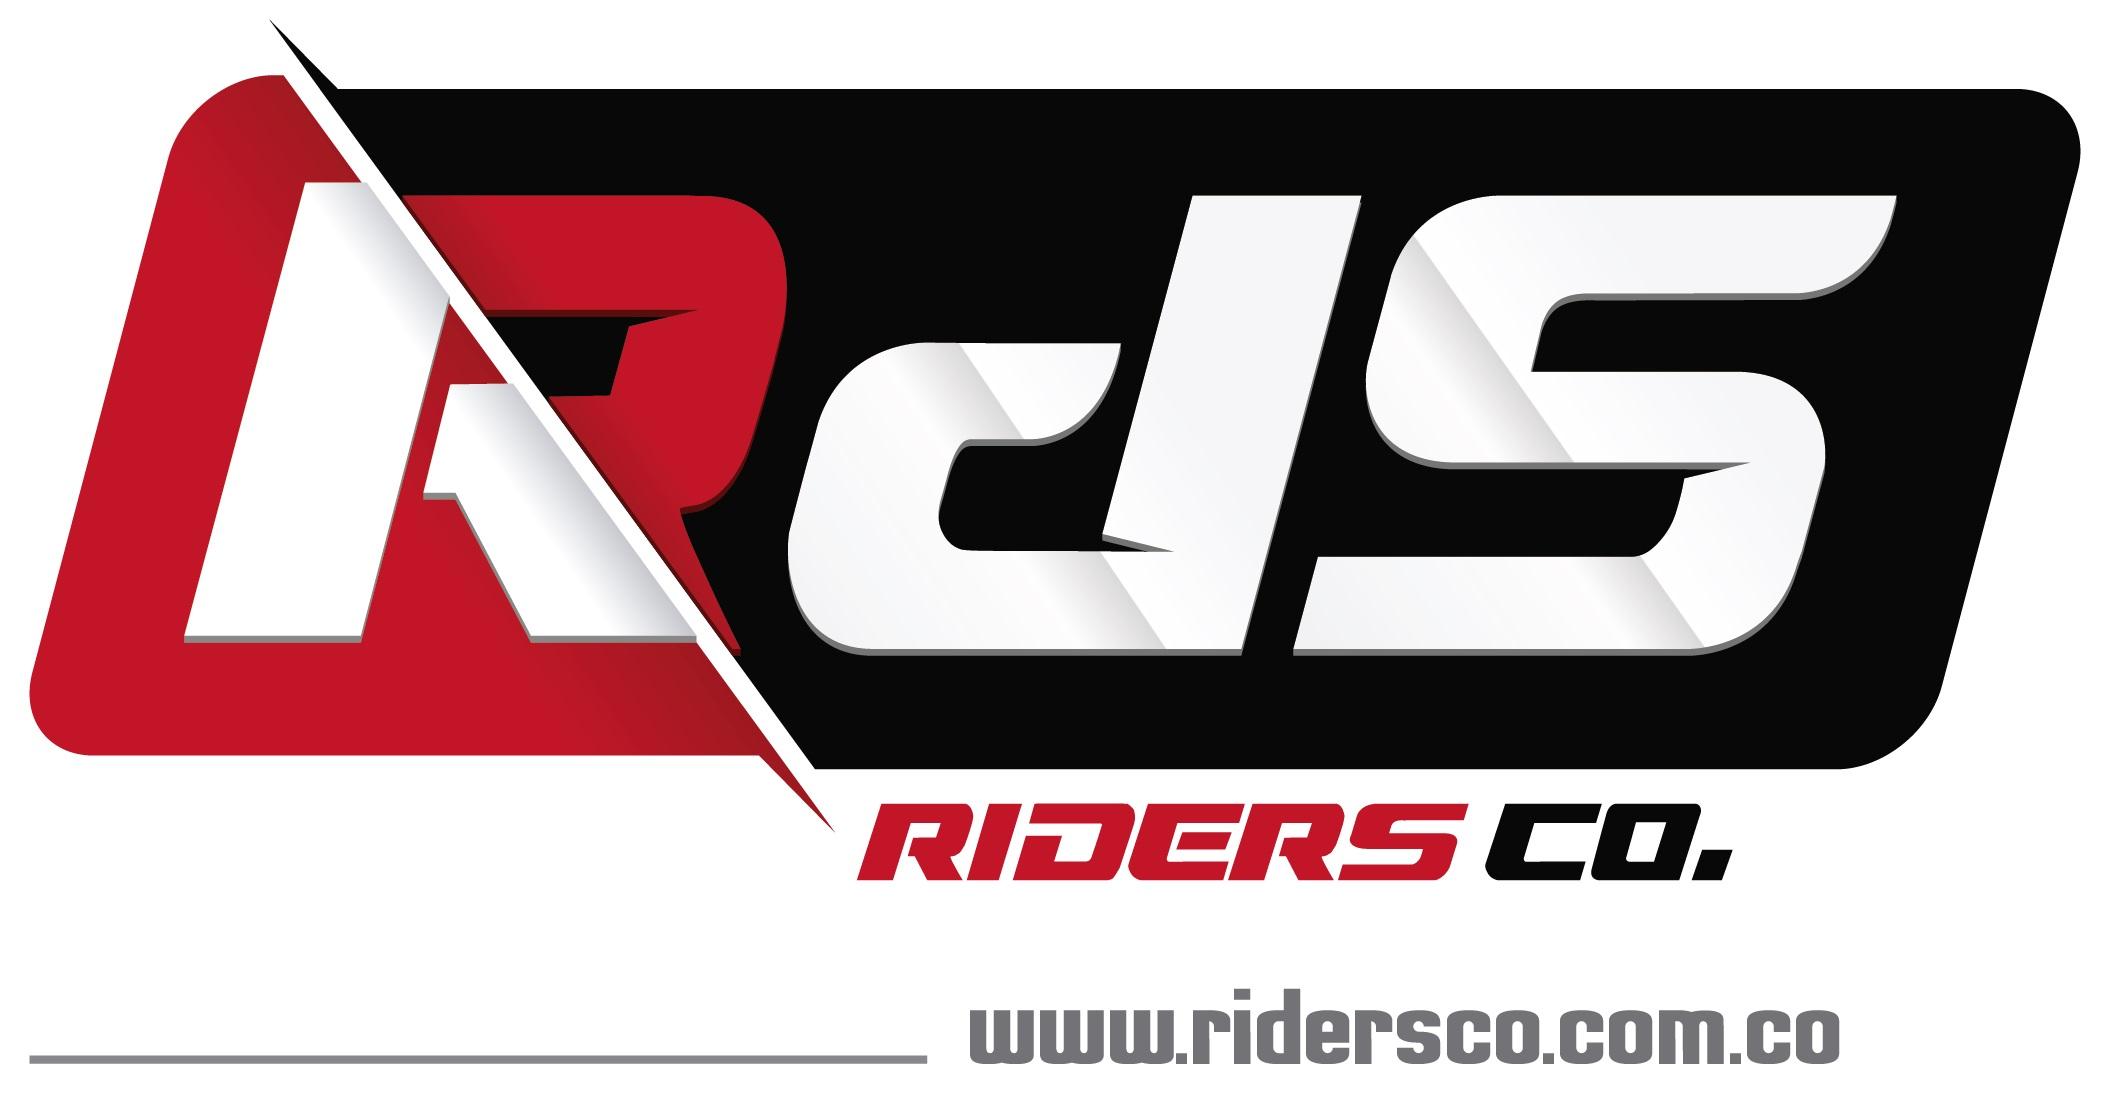 Riders Co